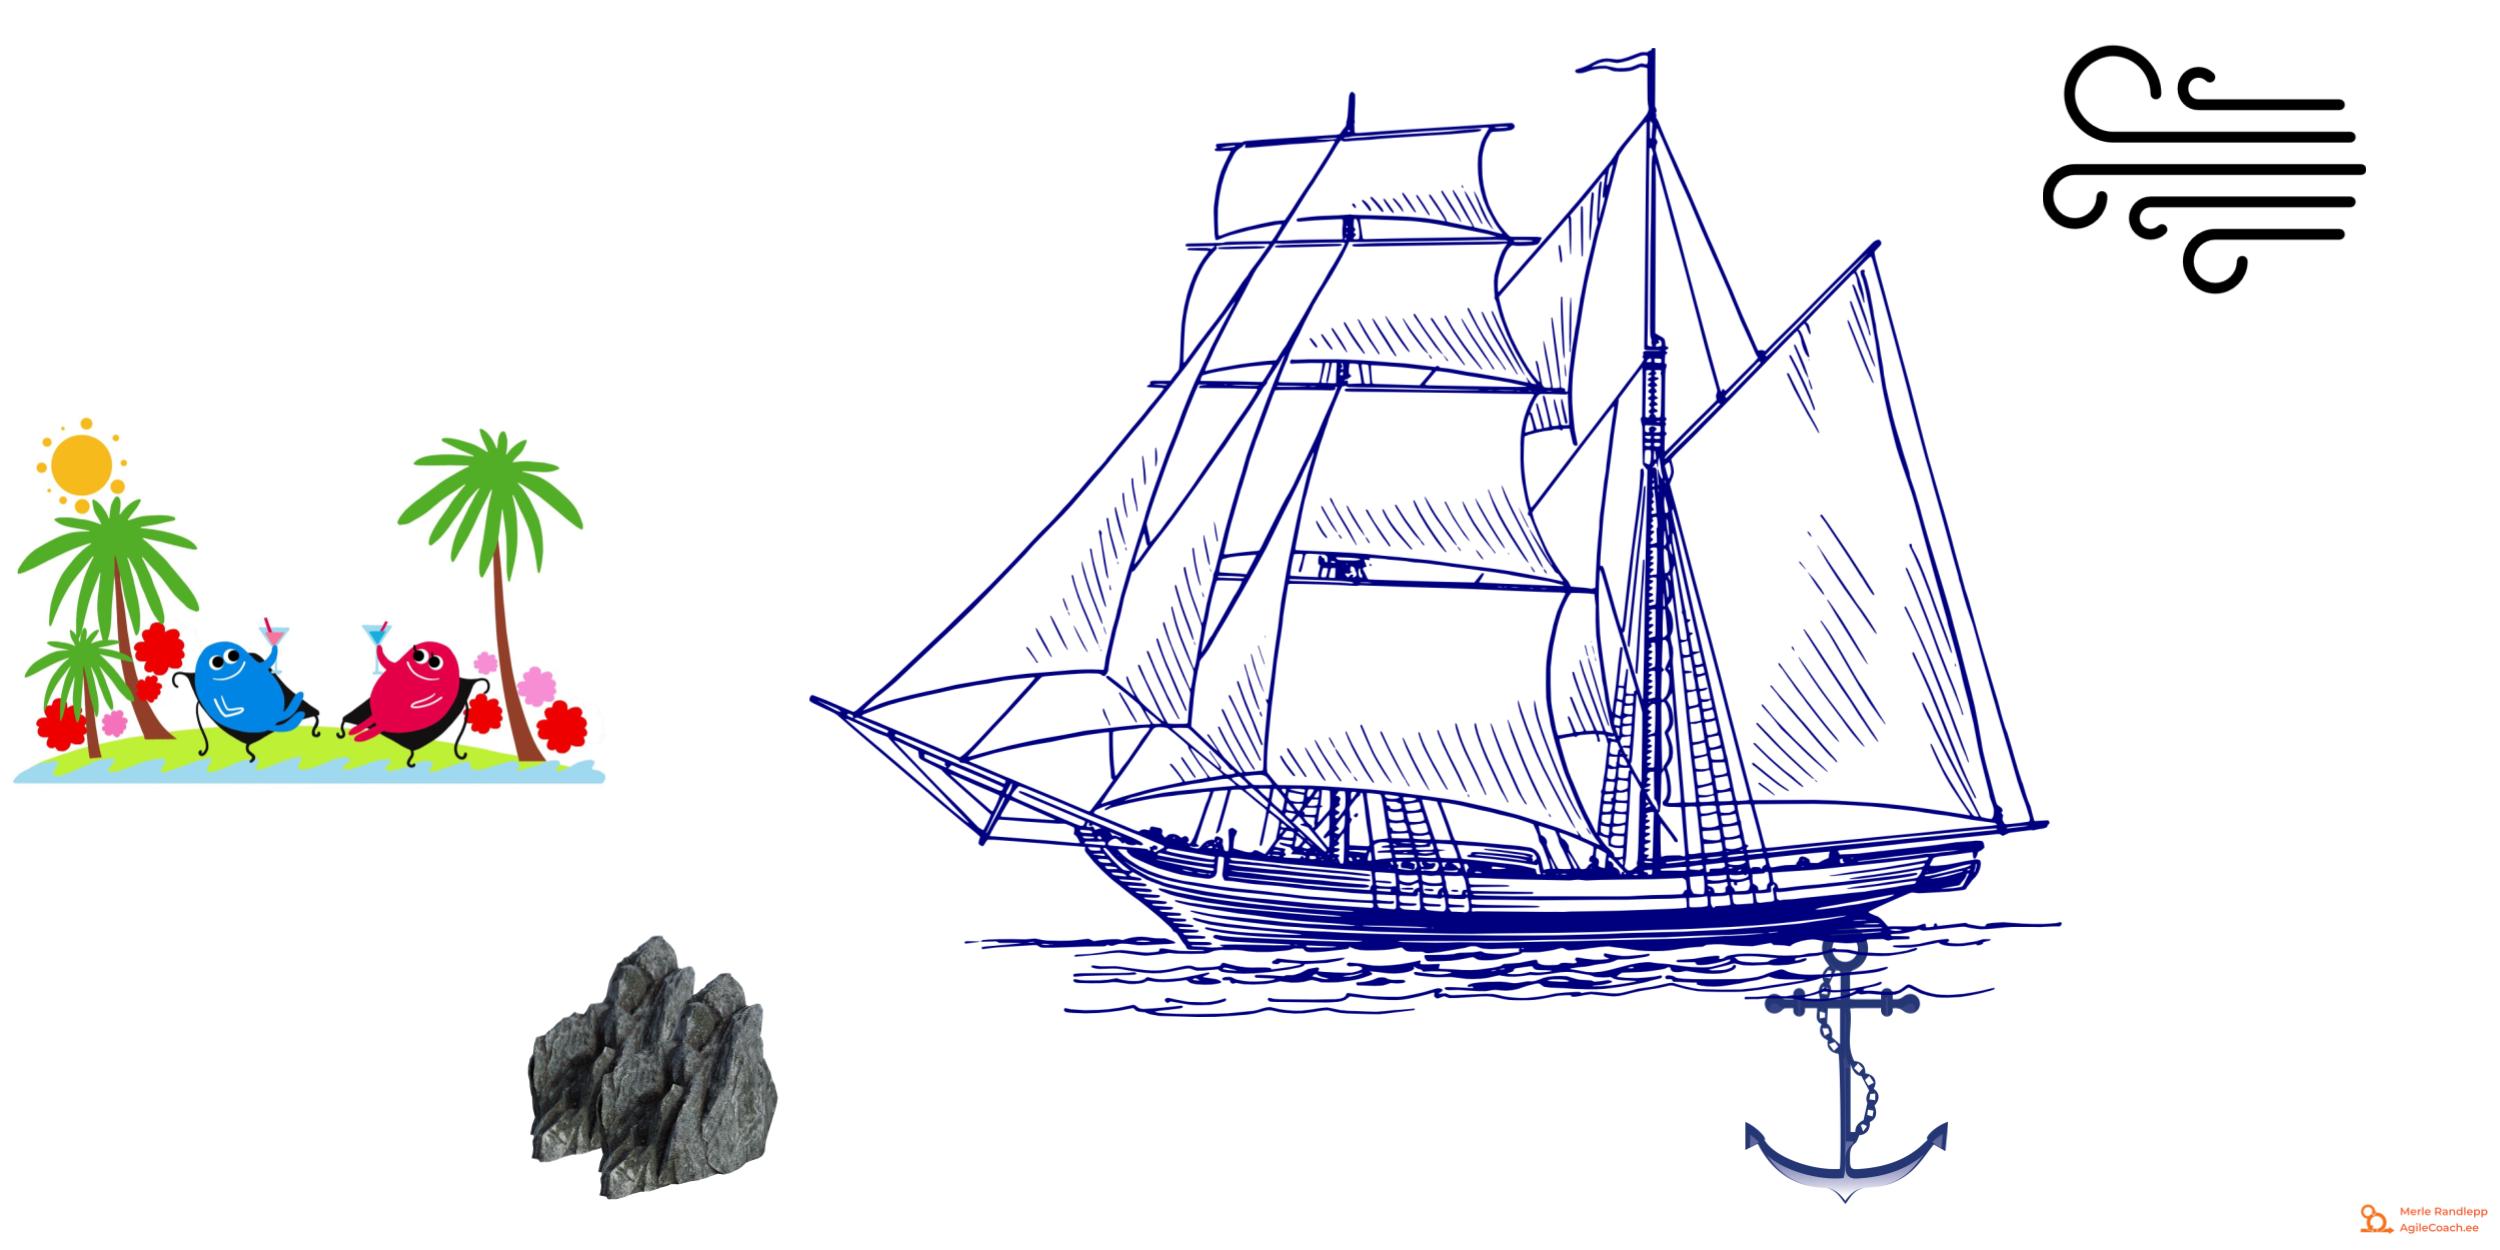 Scrum Retro Sailboat Board by Merle Randlepp